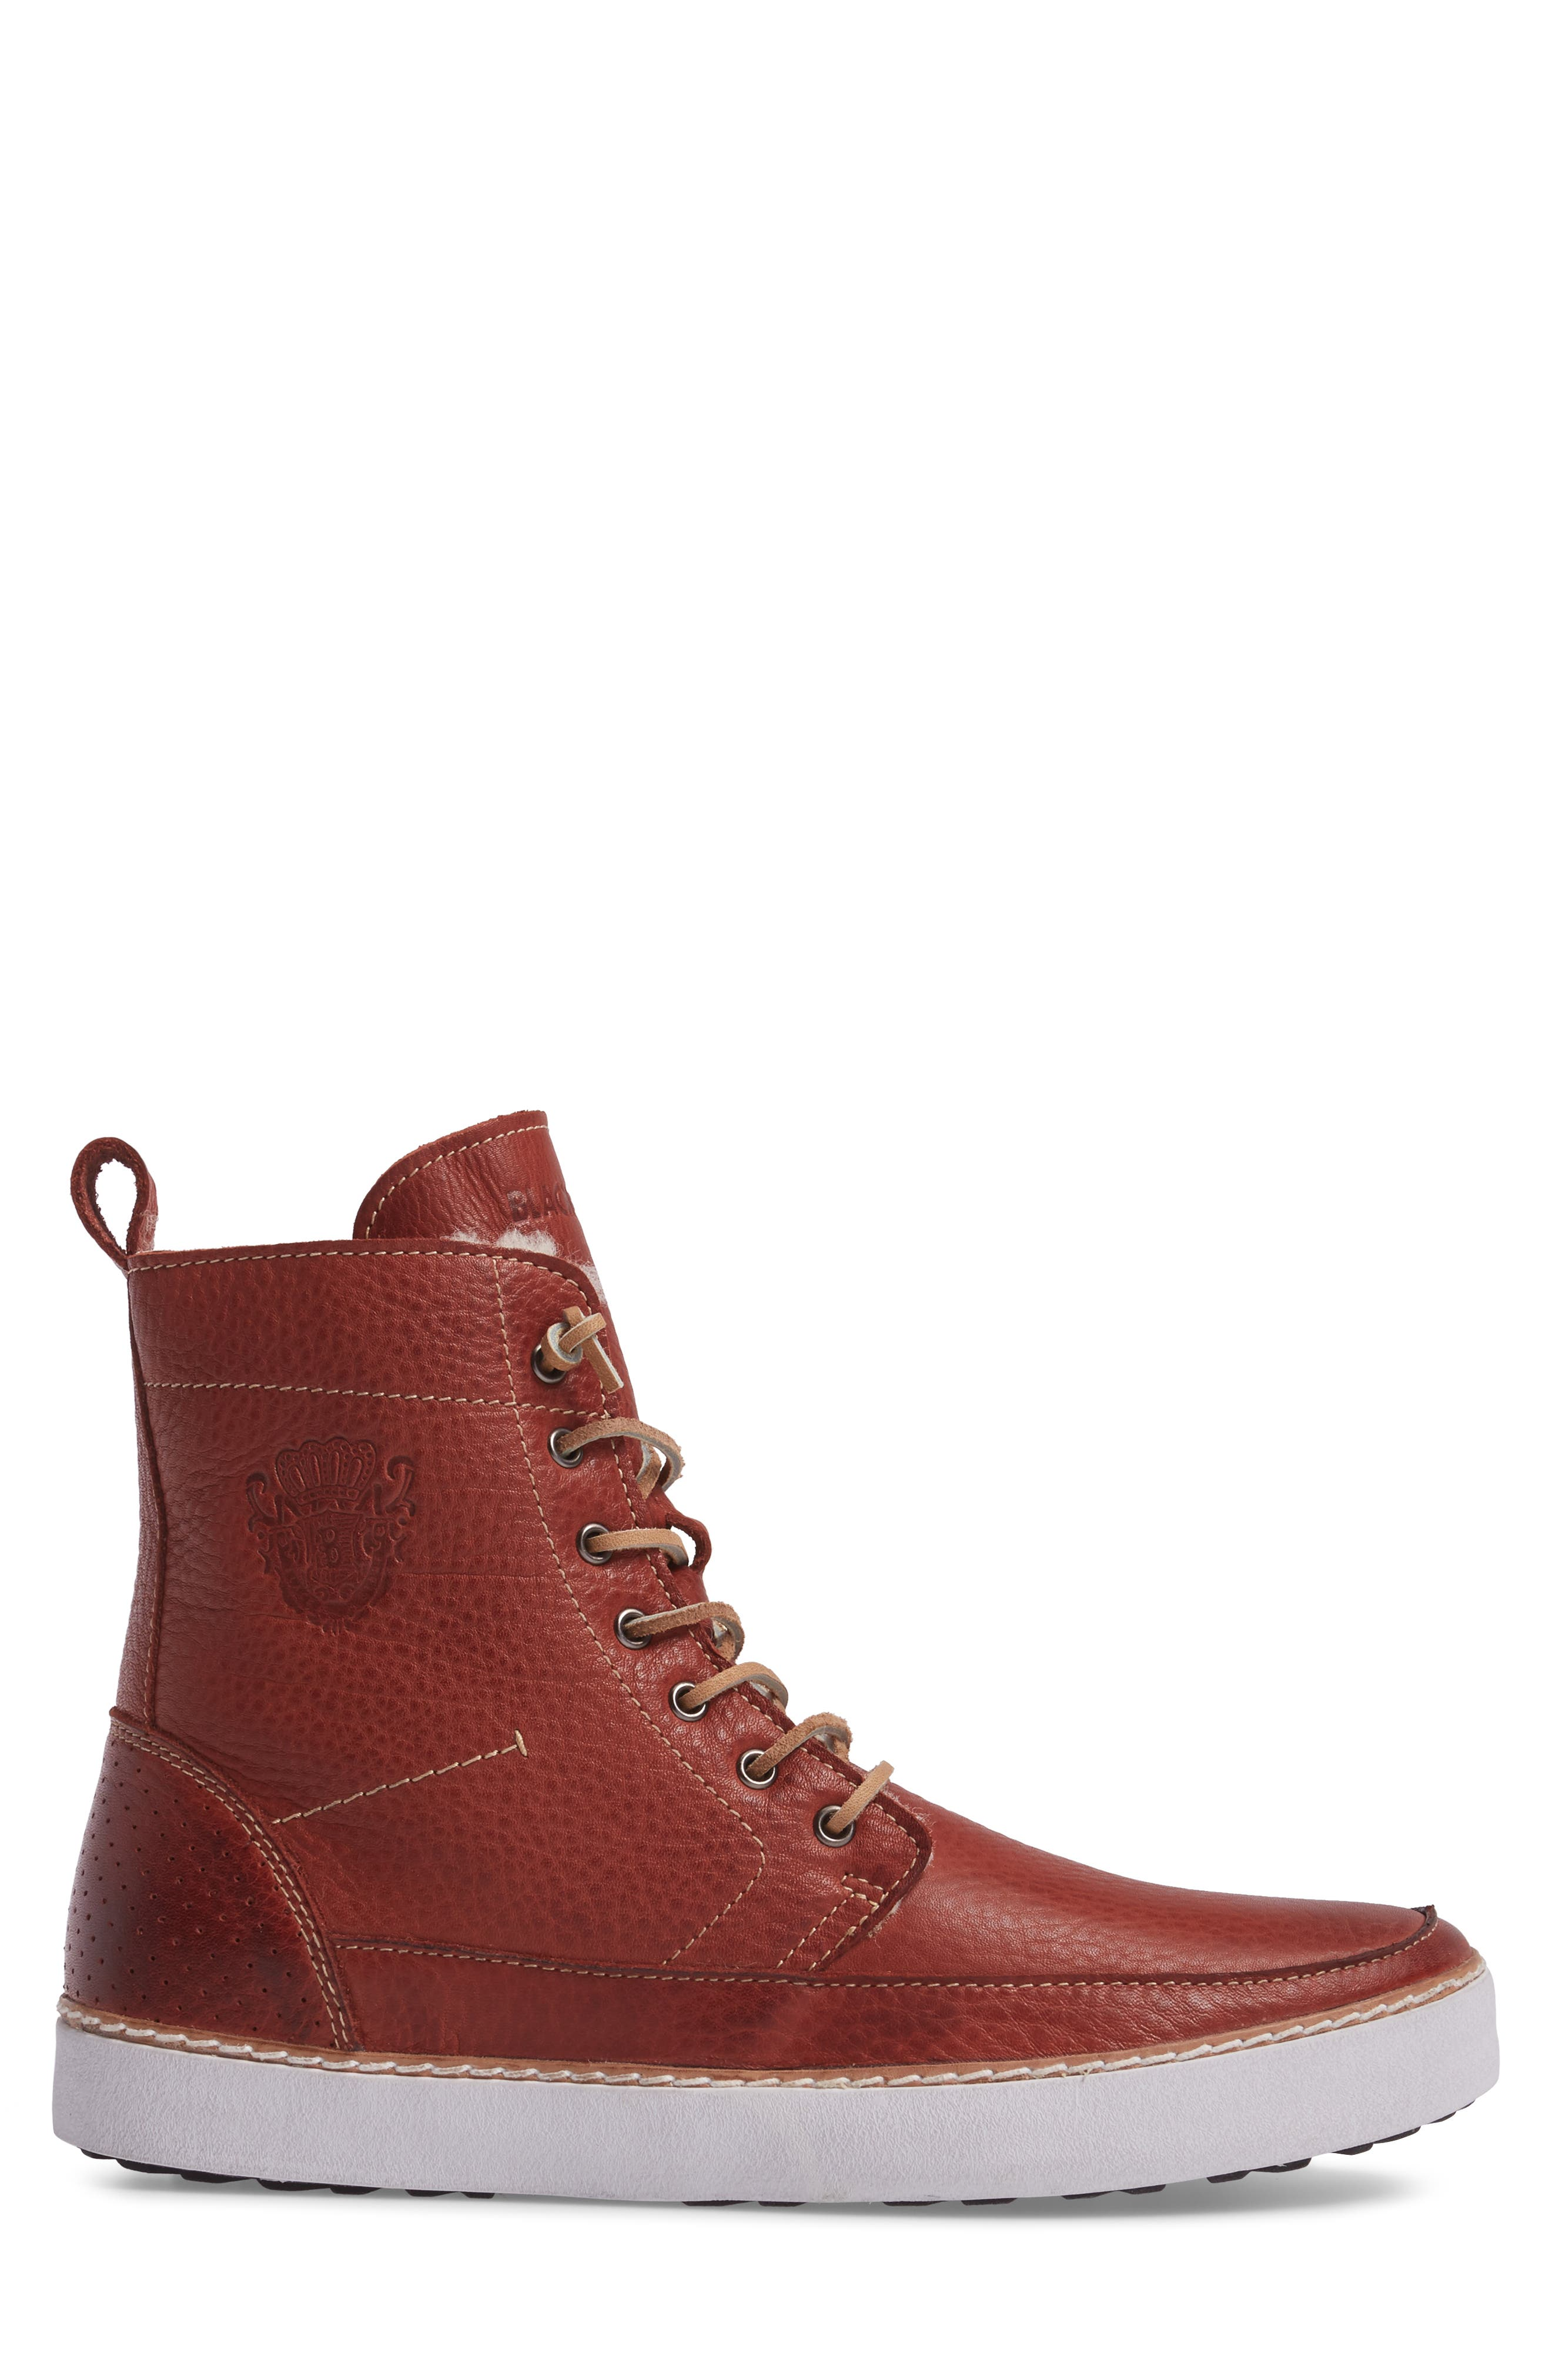 BLACKSTONE,                             'AM 32' Shearling Lined Boot,                             Alternate thumbnail 3, color,                             200